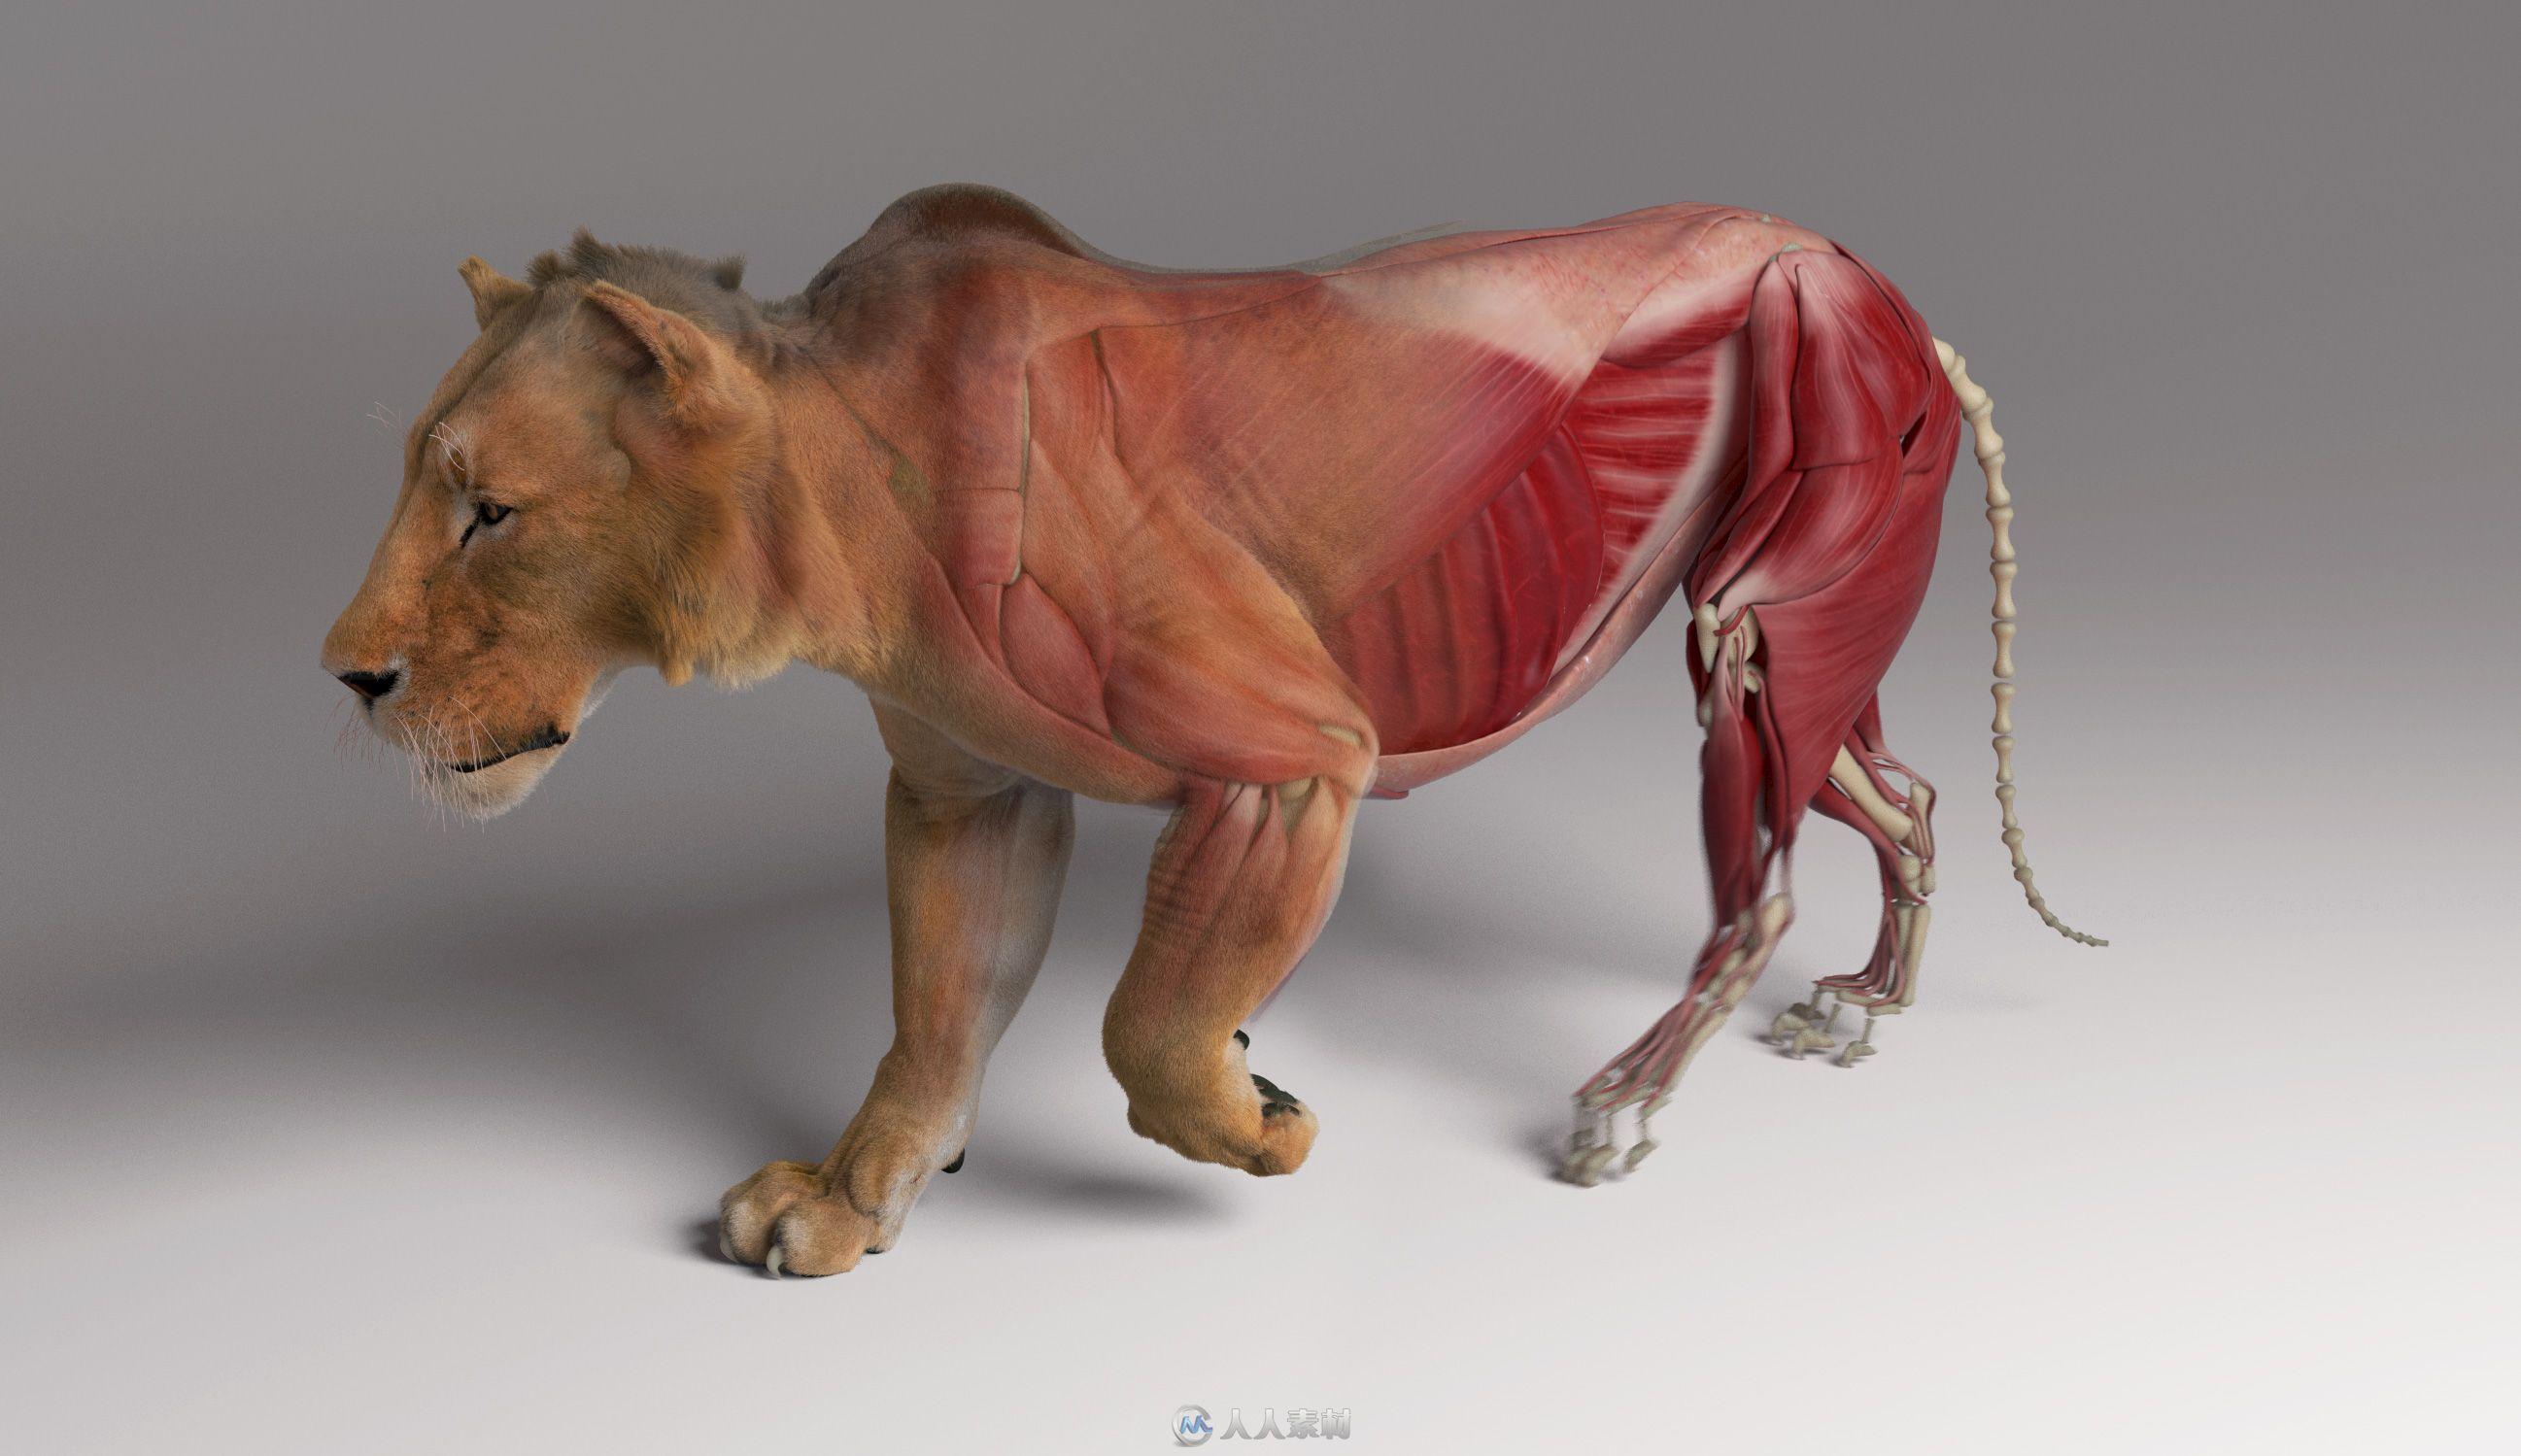 Ziva Dynamics Ziva VFX骨骼肌肉运动模拟Maya插件V1.6版48 / 作者:抱着猫的老鼠 / 帖子ID:16755361,5650261